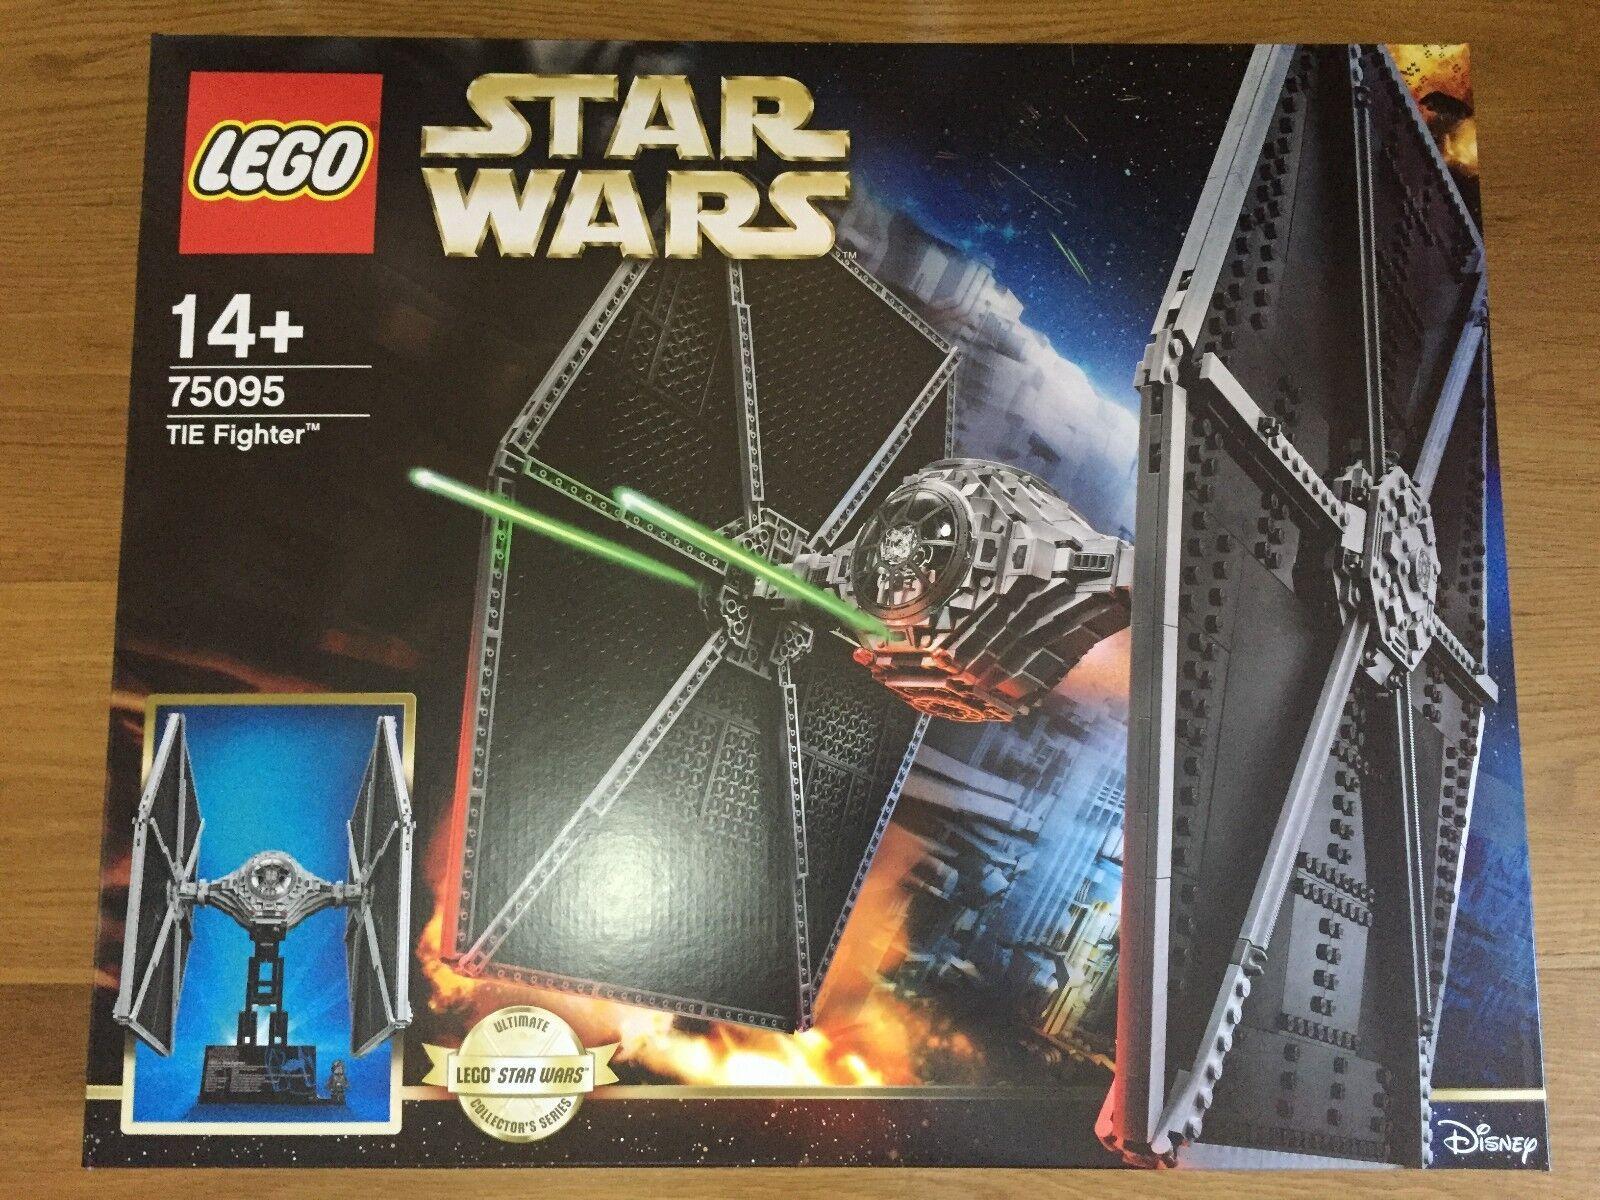 NUOVO  LEGO estrella guerras 75095 Tie combatiente  UCS   esclusivo  scelta migliore